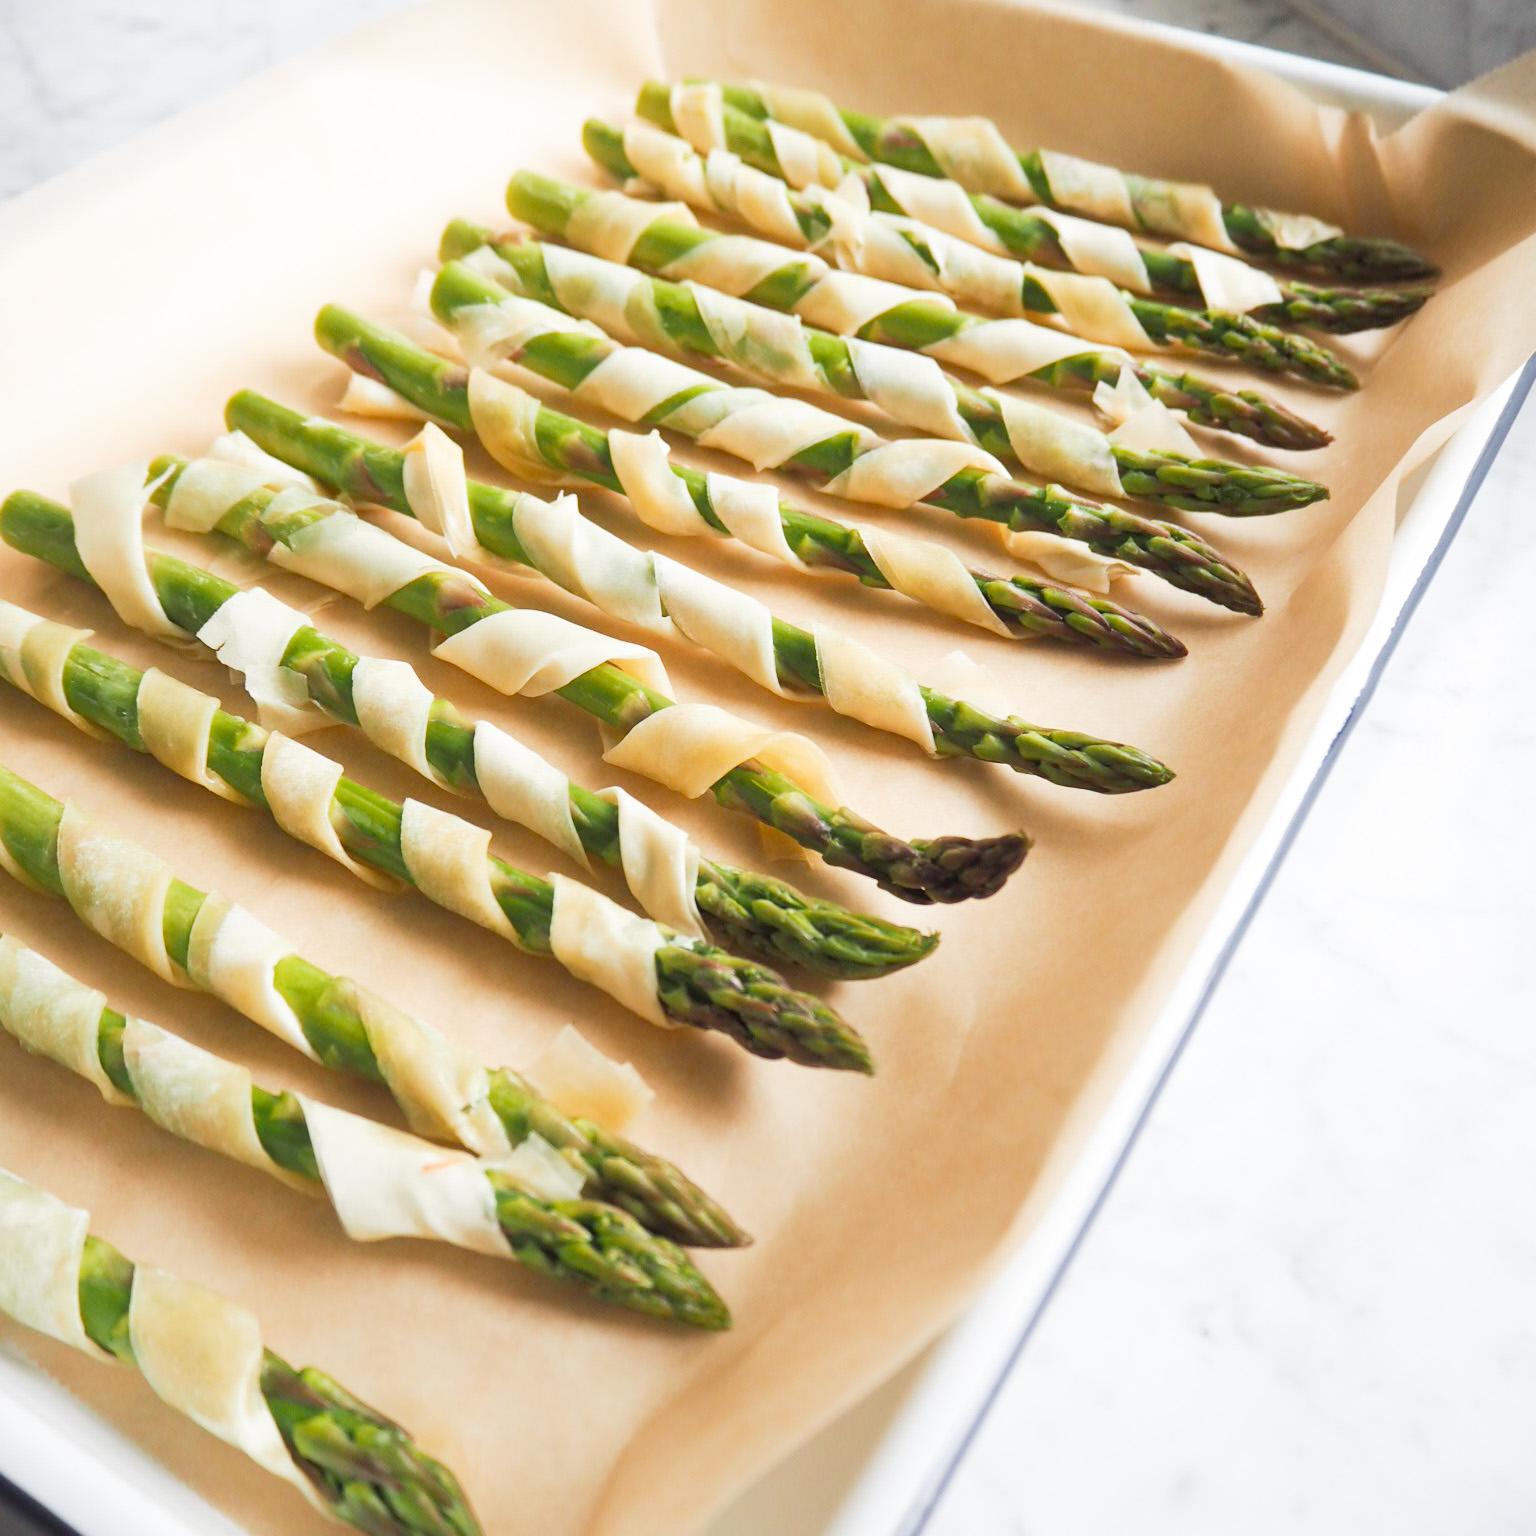 asparaguswithfilopreppedsq.jpg